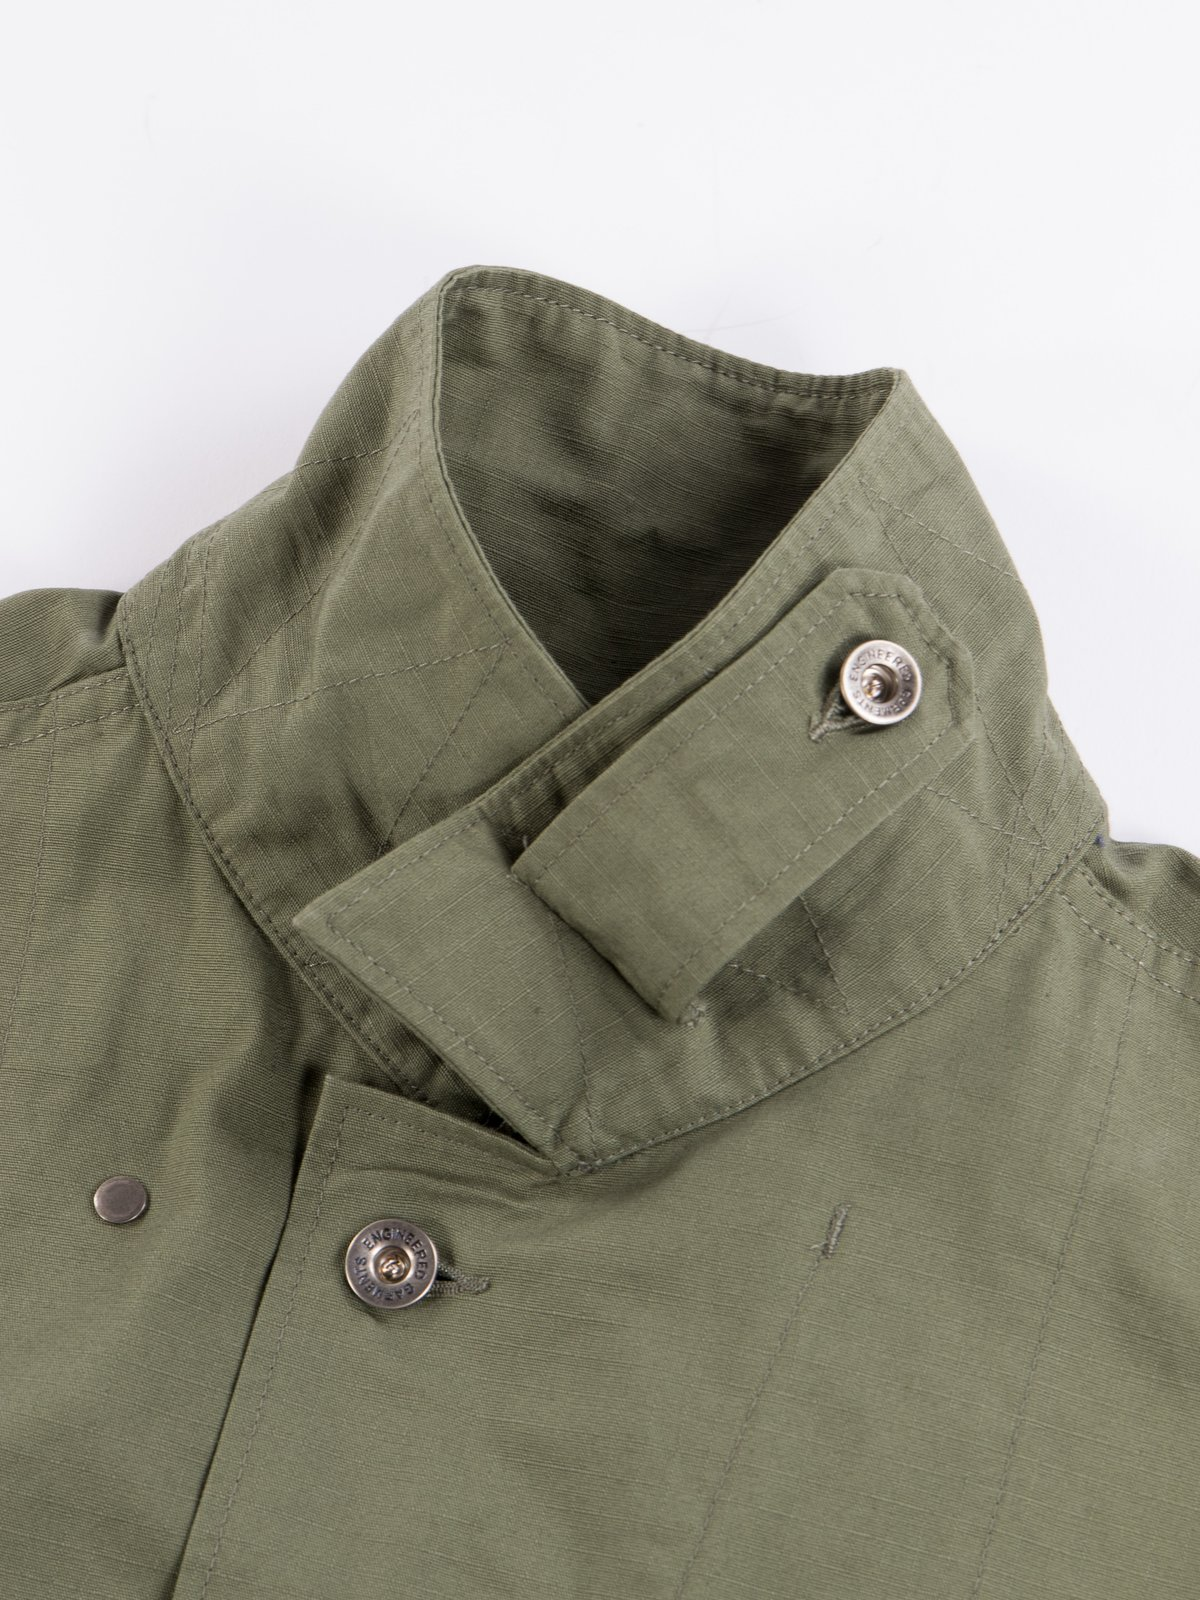 Olive Cotton Ripstop M43/2 Shirt Jacket - Image 6